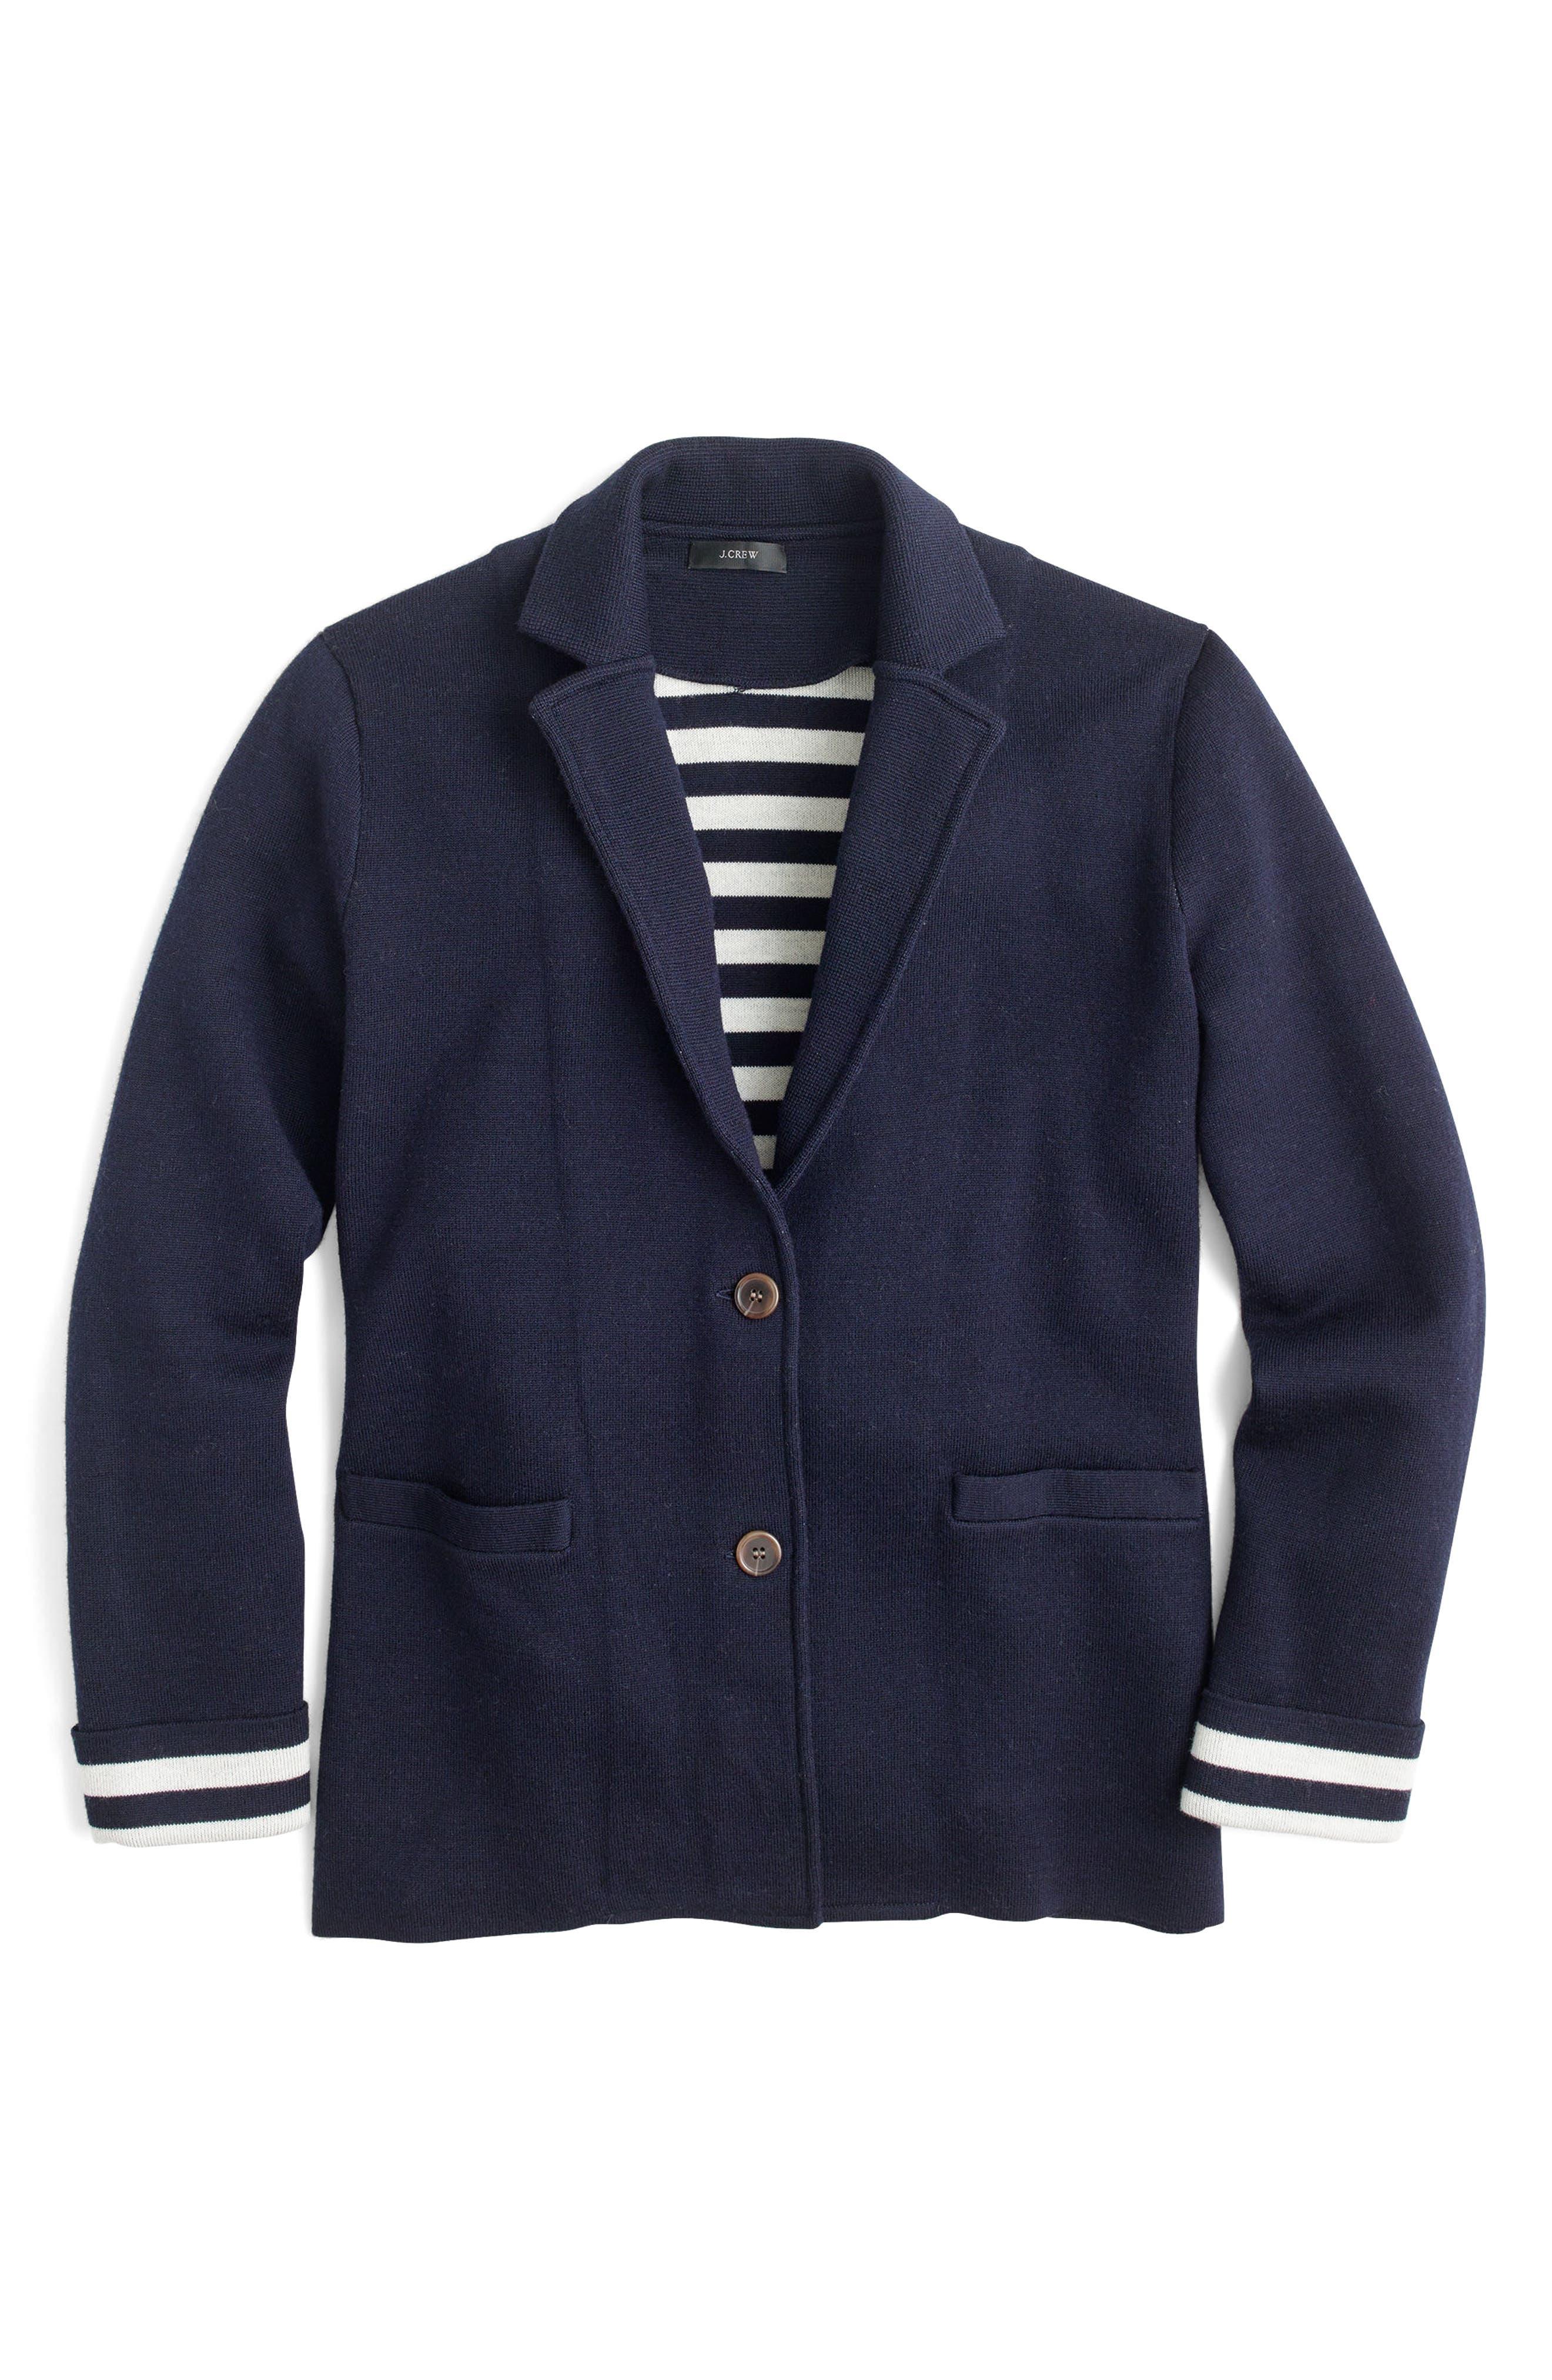 Stripe Lining Merino Wool Sweater Blazer,                             Alternate thumbnail 4, color,                             400